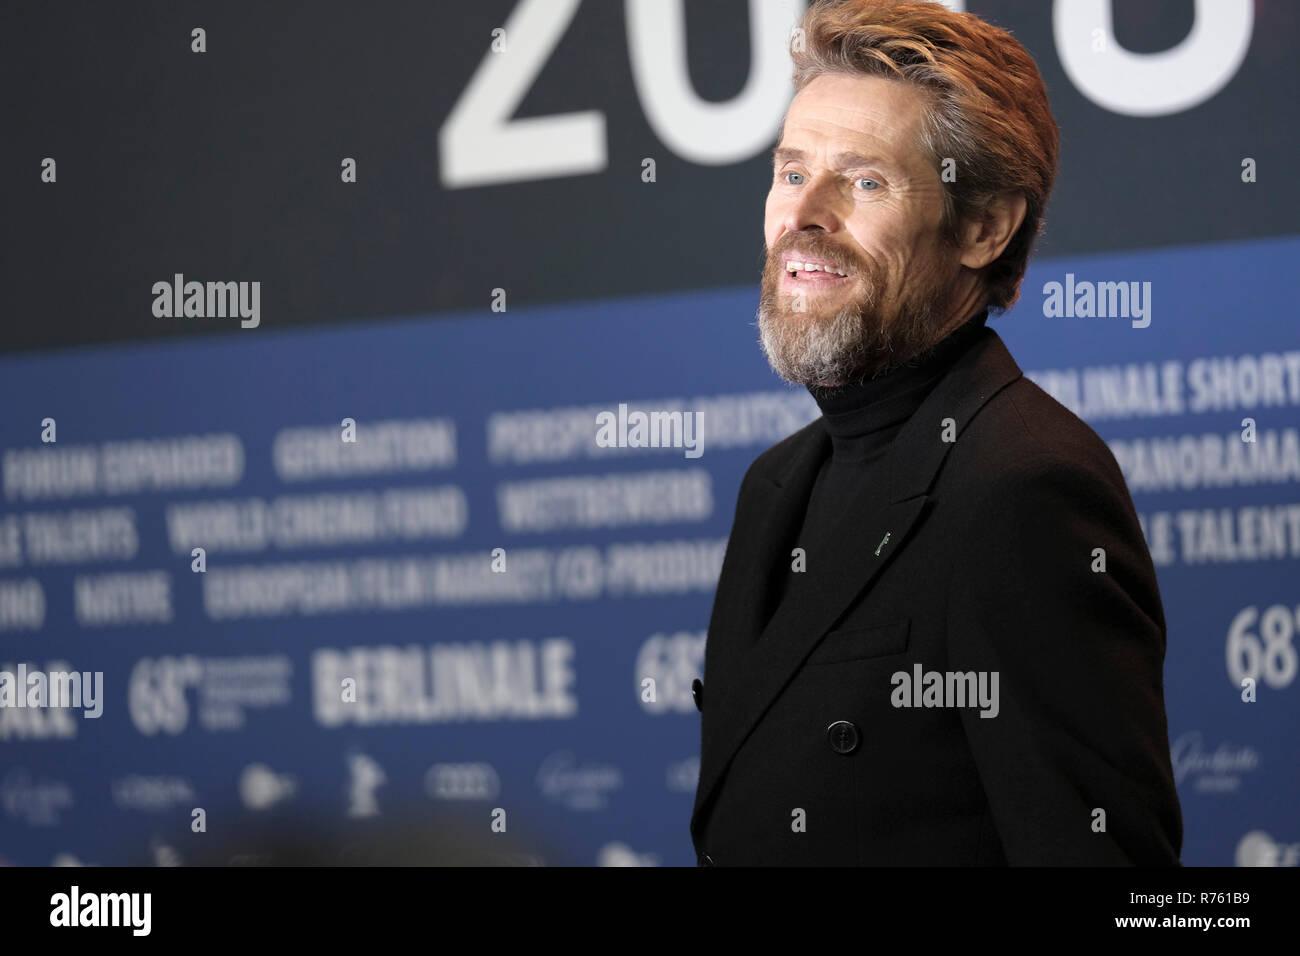 Willem Dafoe - Pressekonferenz, Berlinale 2018, 20. Februar 2018, Berlin. Stock Photo